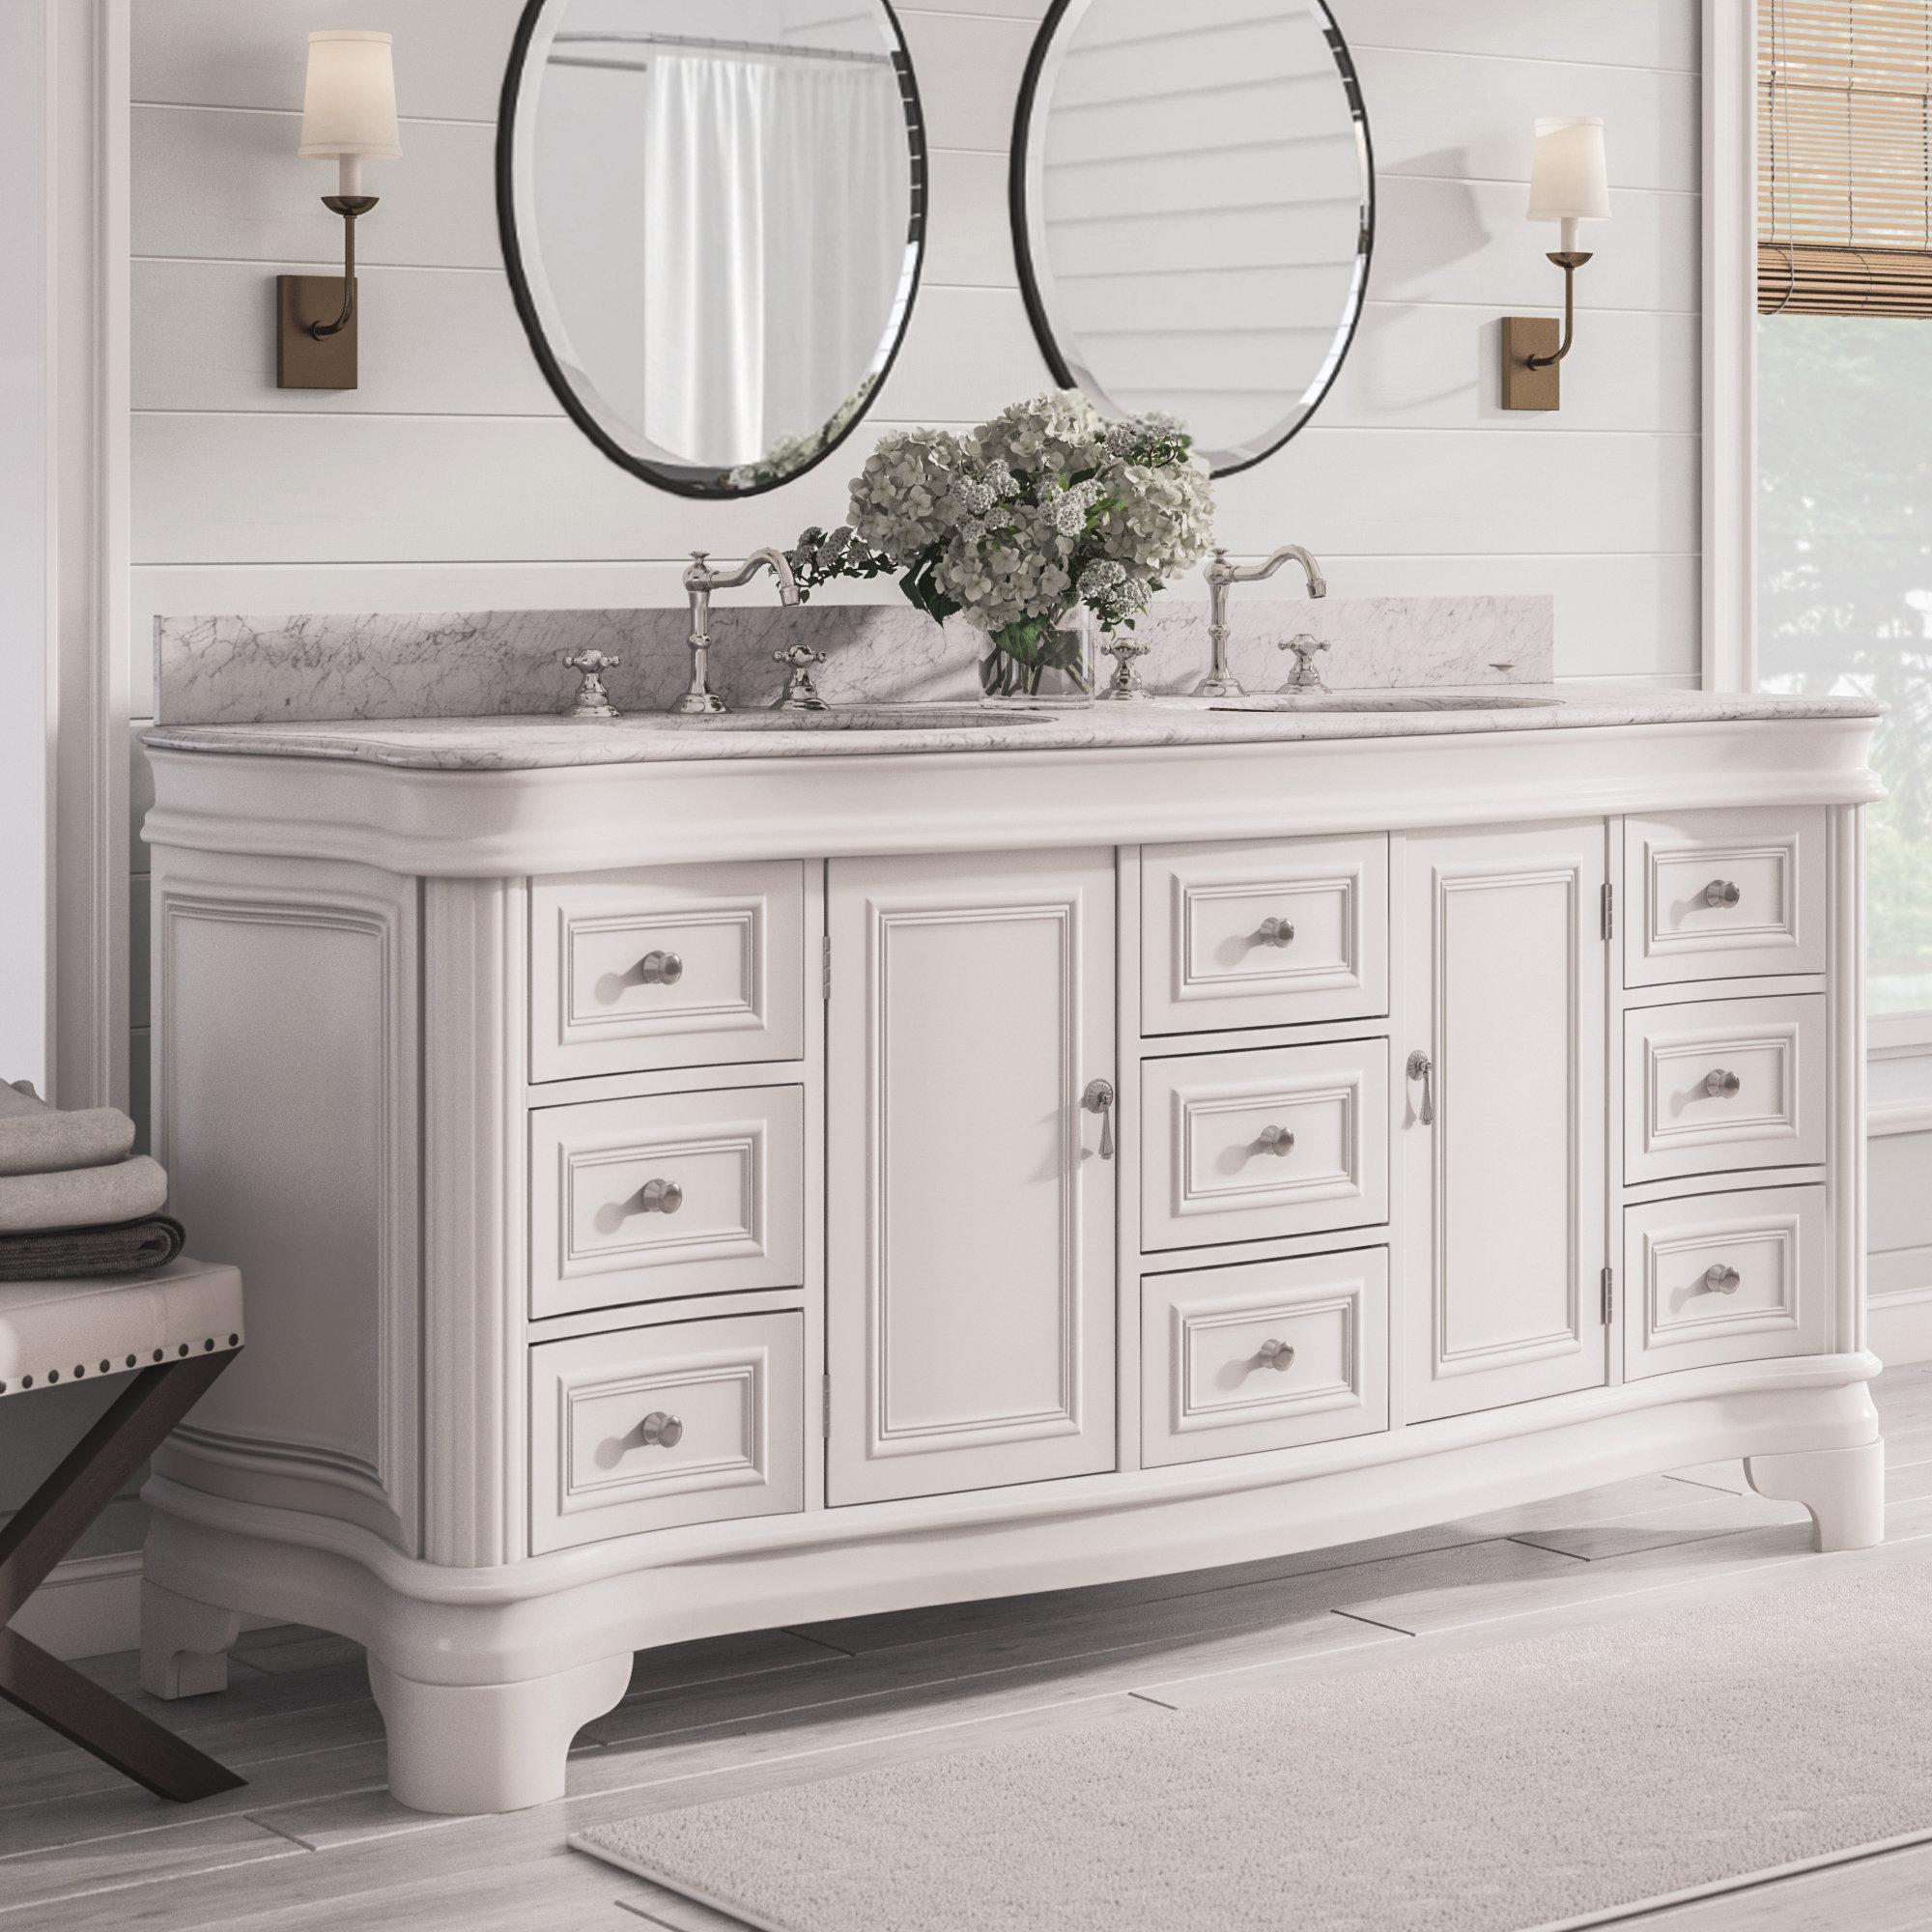 Terrific Double Vanity With Makeup Wayfair Interior Design Ideas Skatsoteloinfo